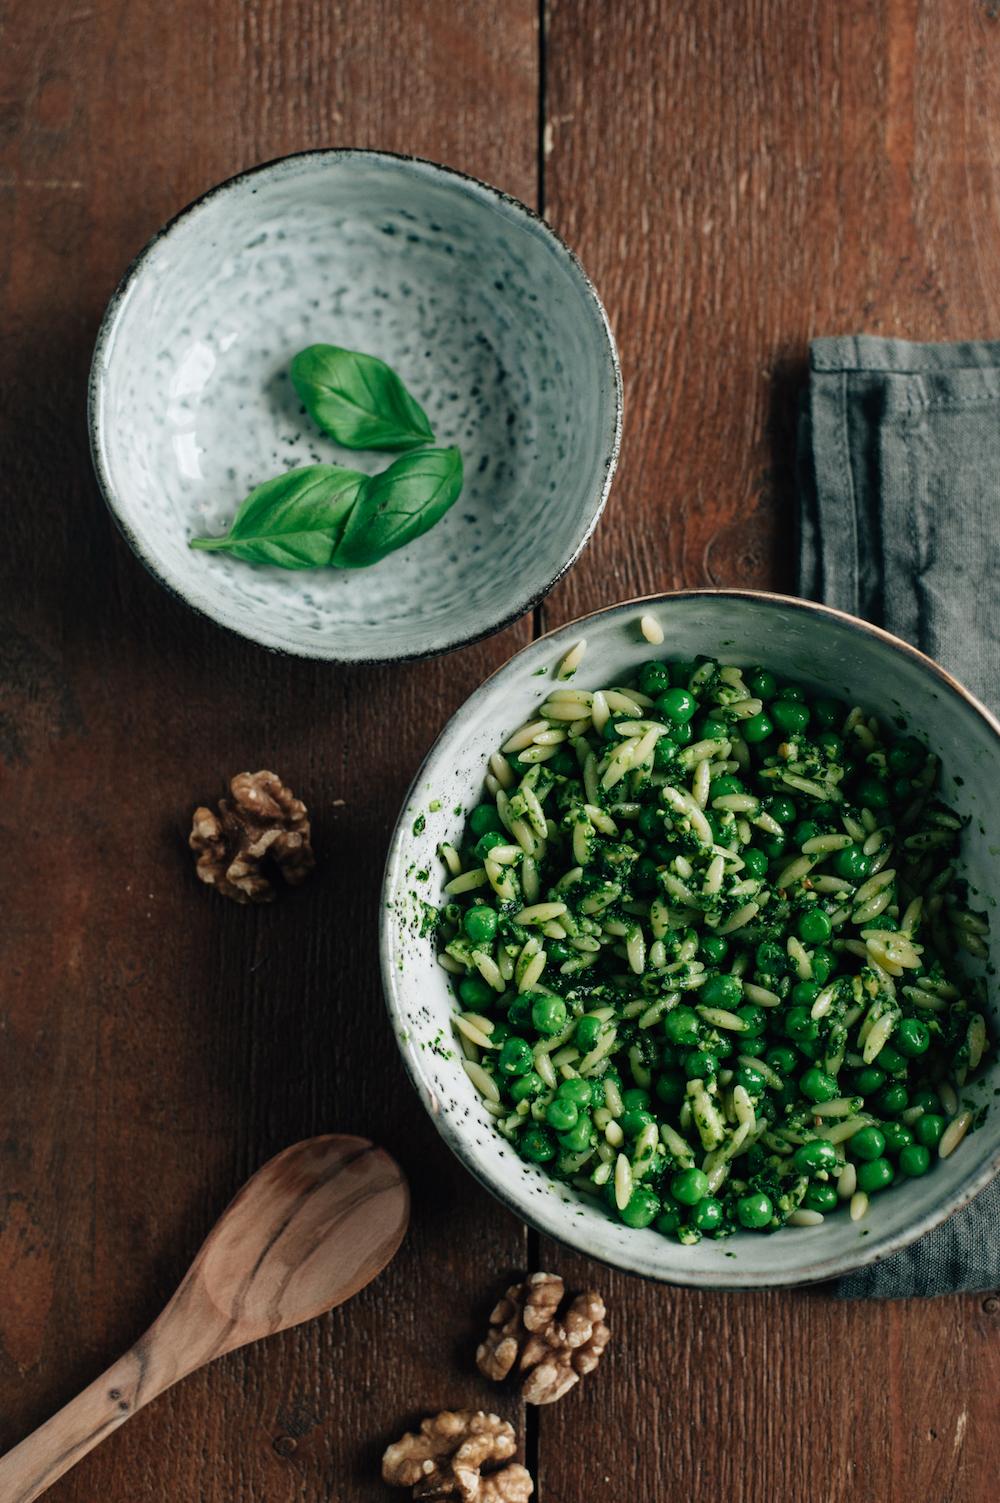 foodfotografie met foodstyling, green food